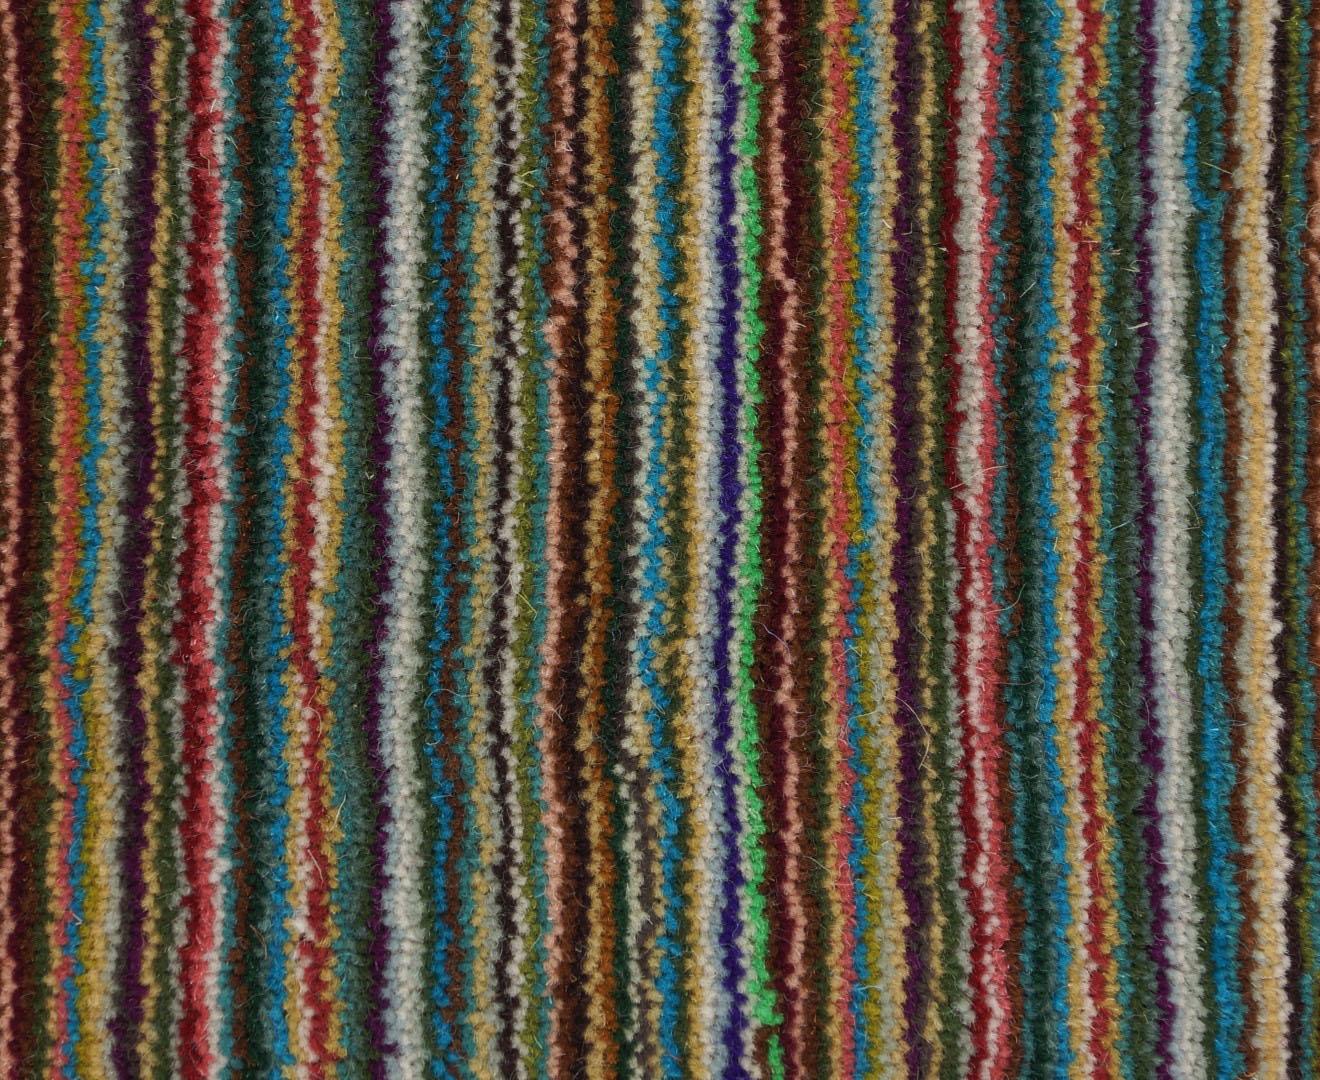 Moquette tiss e 100 laine unie structur e ray e milres azur collection textile dessins for Moquette rayee